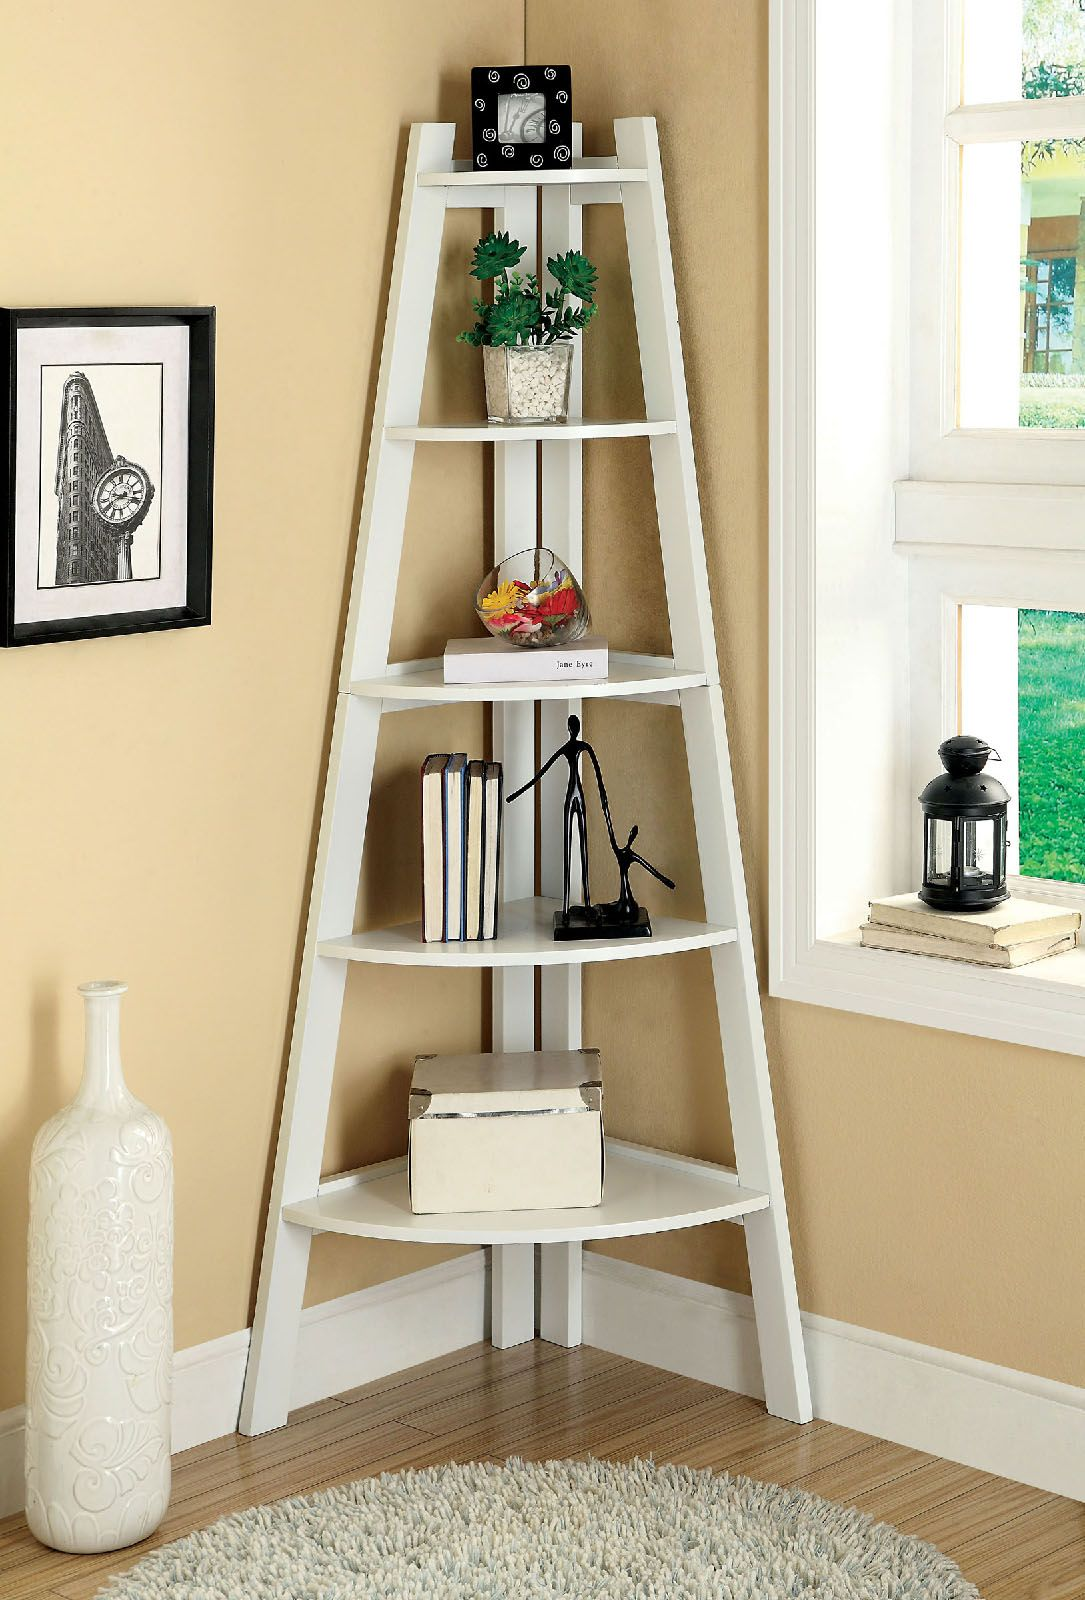 Furniture Of America CM AC6214WH Contemporary Corner 5 Tier Ladder Shelf Bookcase In White Finish